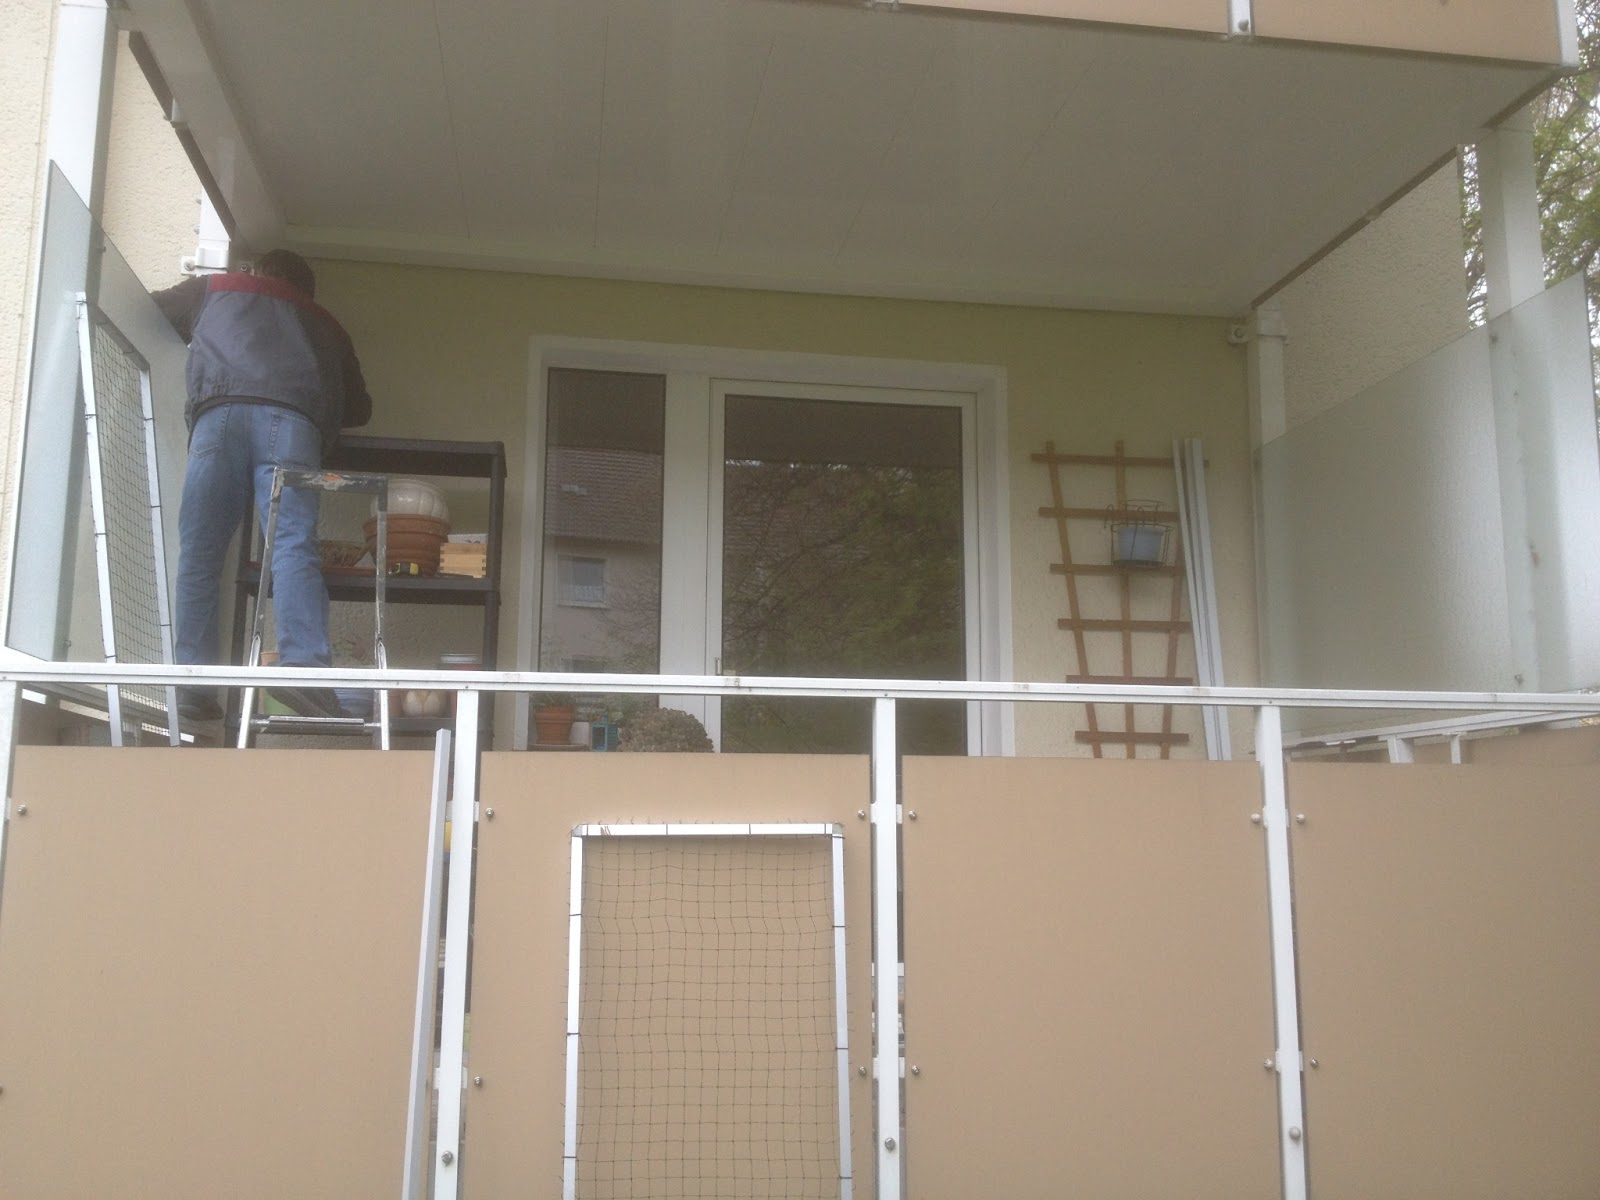 sonnenschutz balkon ohne bohren carprola for. Black Bedroom Furniture Sets. Home Design Ideas